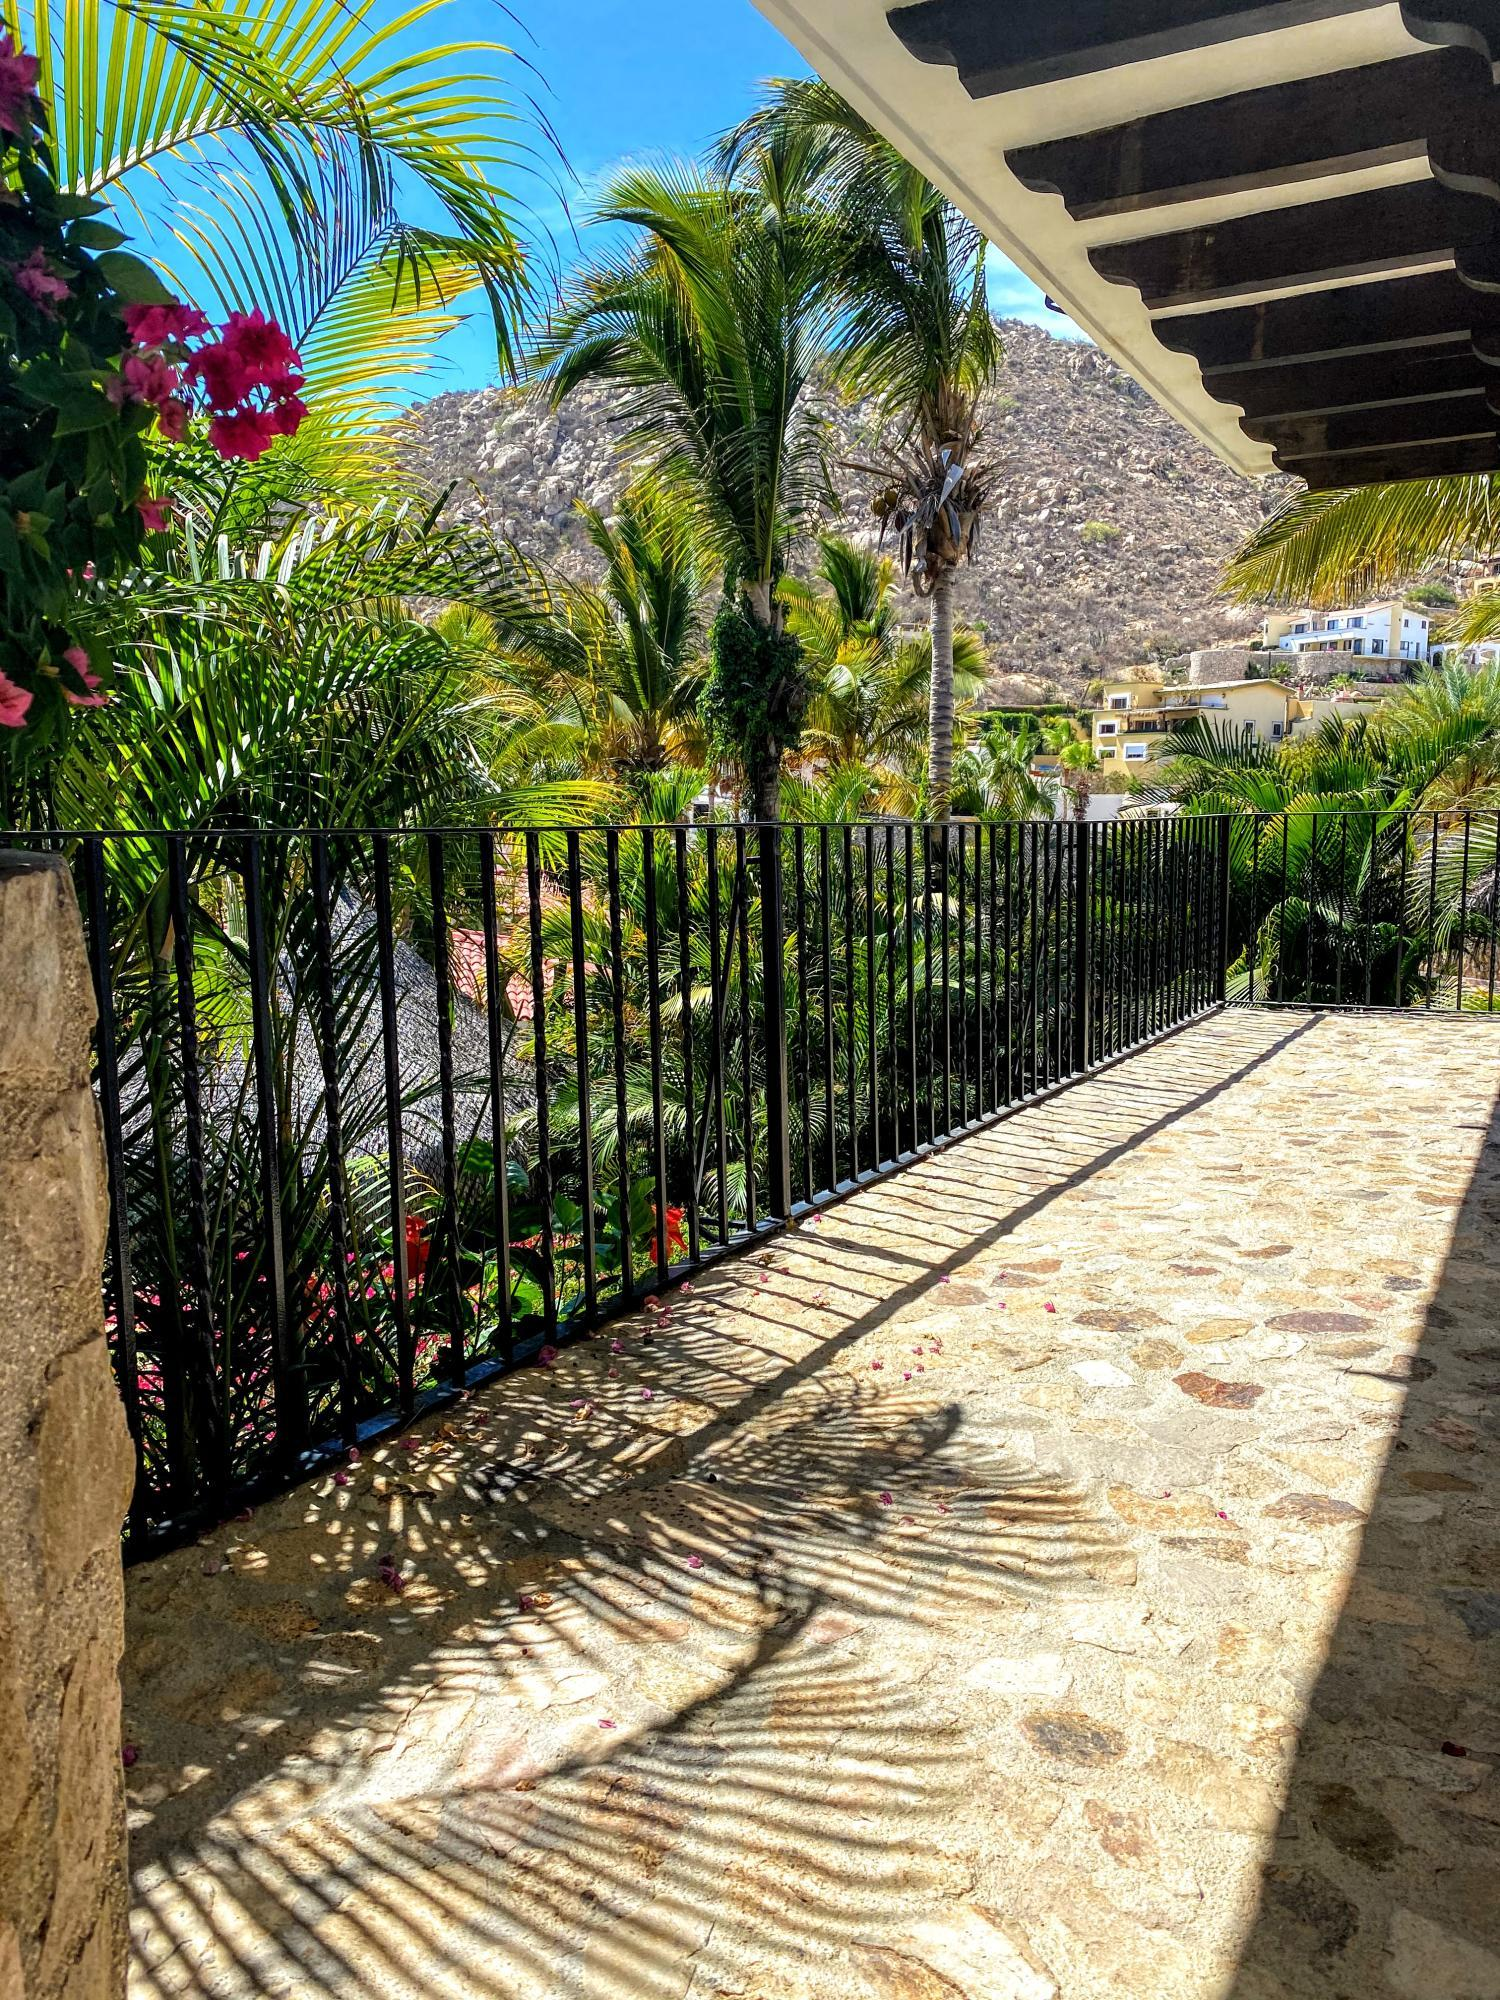 Camino del Parque # Margarita